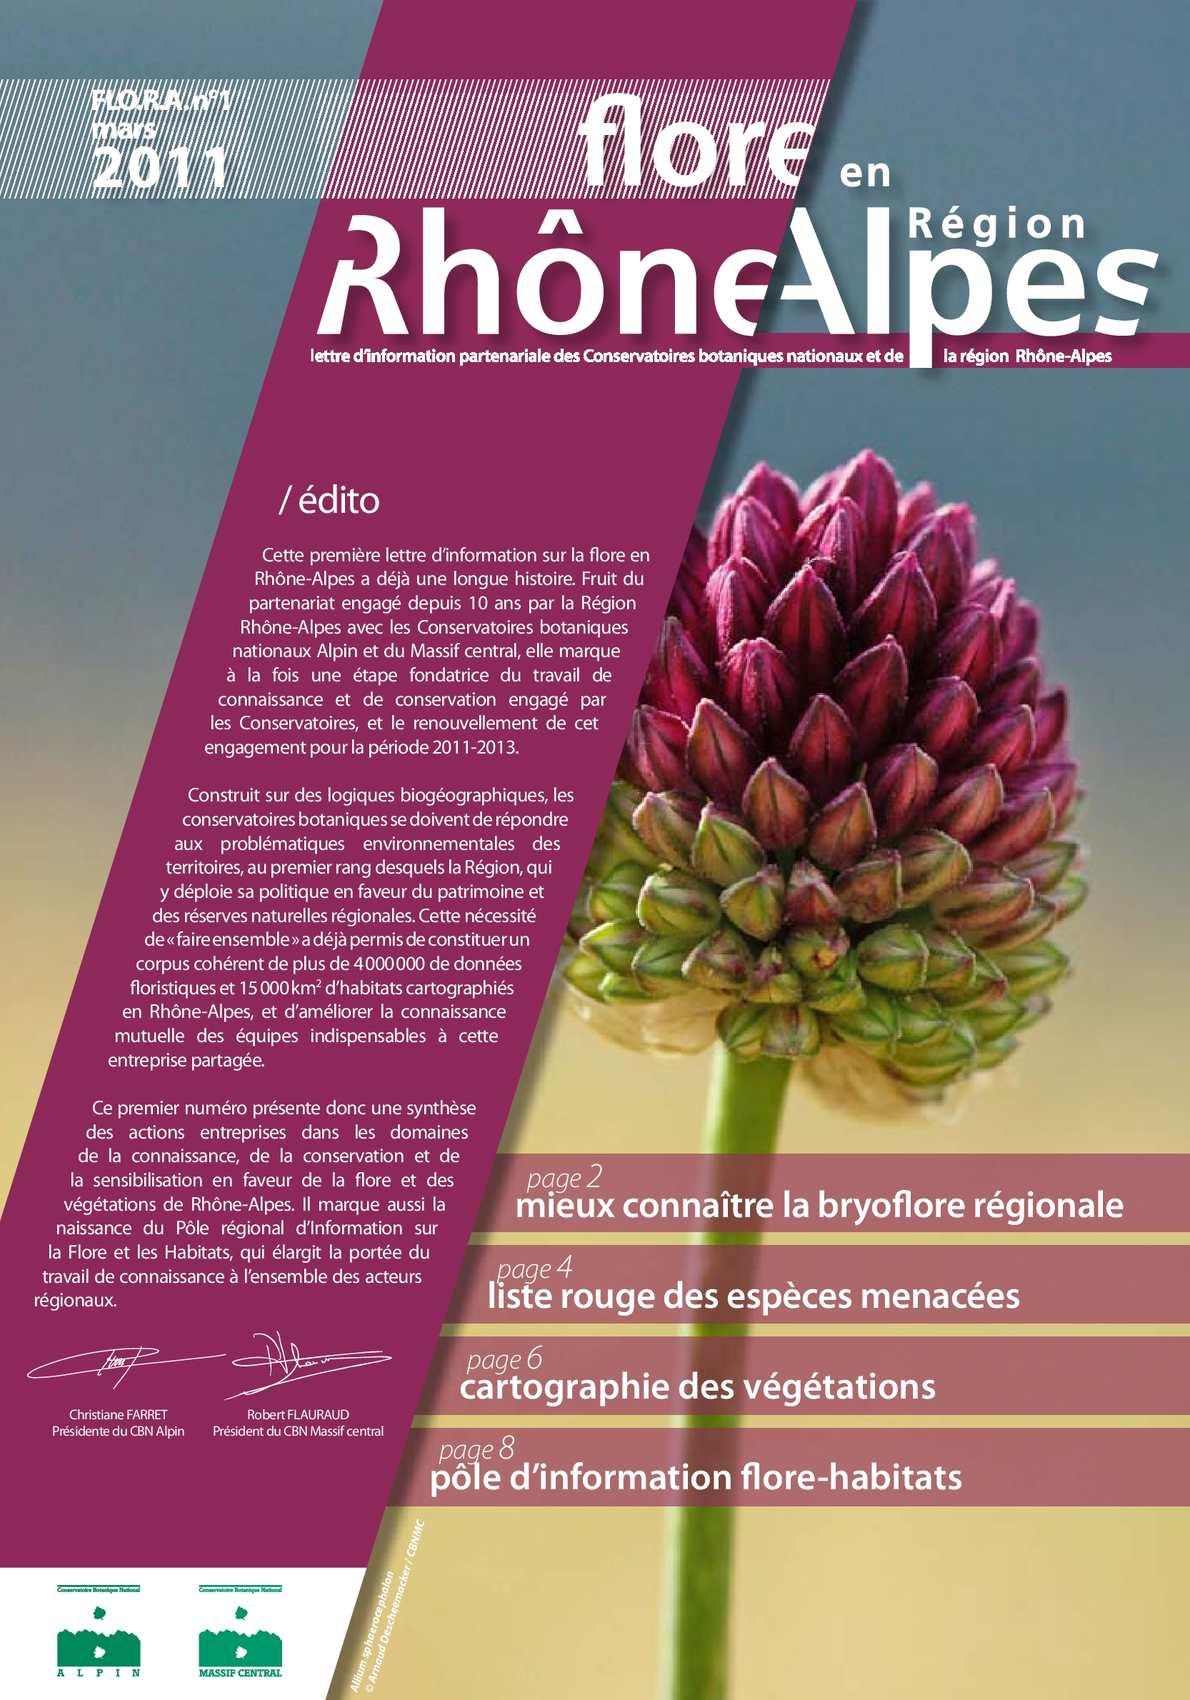 Calaméo - FLO.R.A. Flore en Rhône-Alpes n°1 - mars 2011 e2467642210